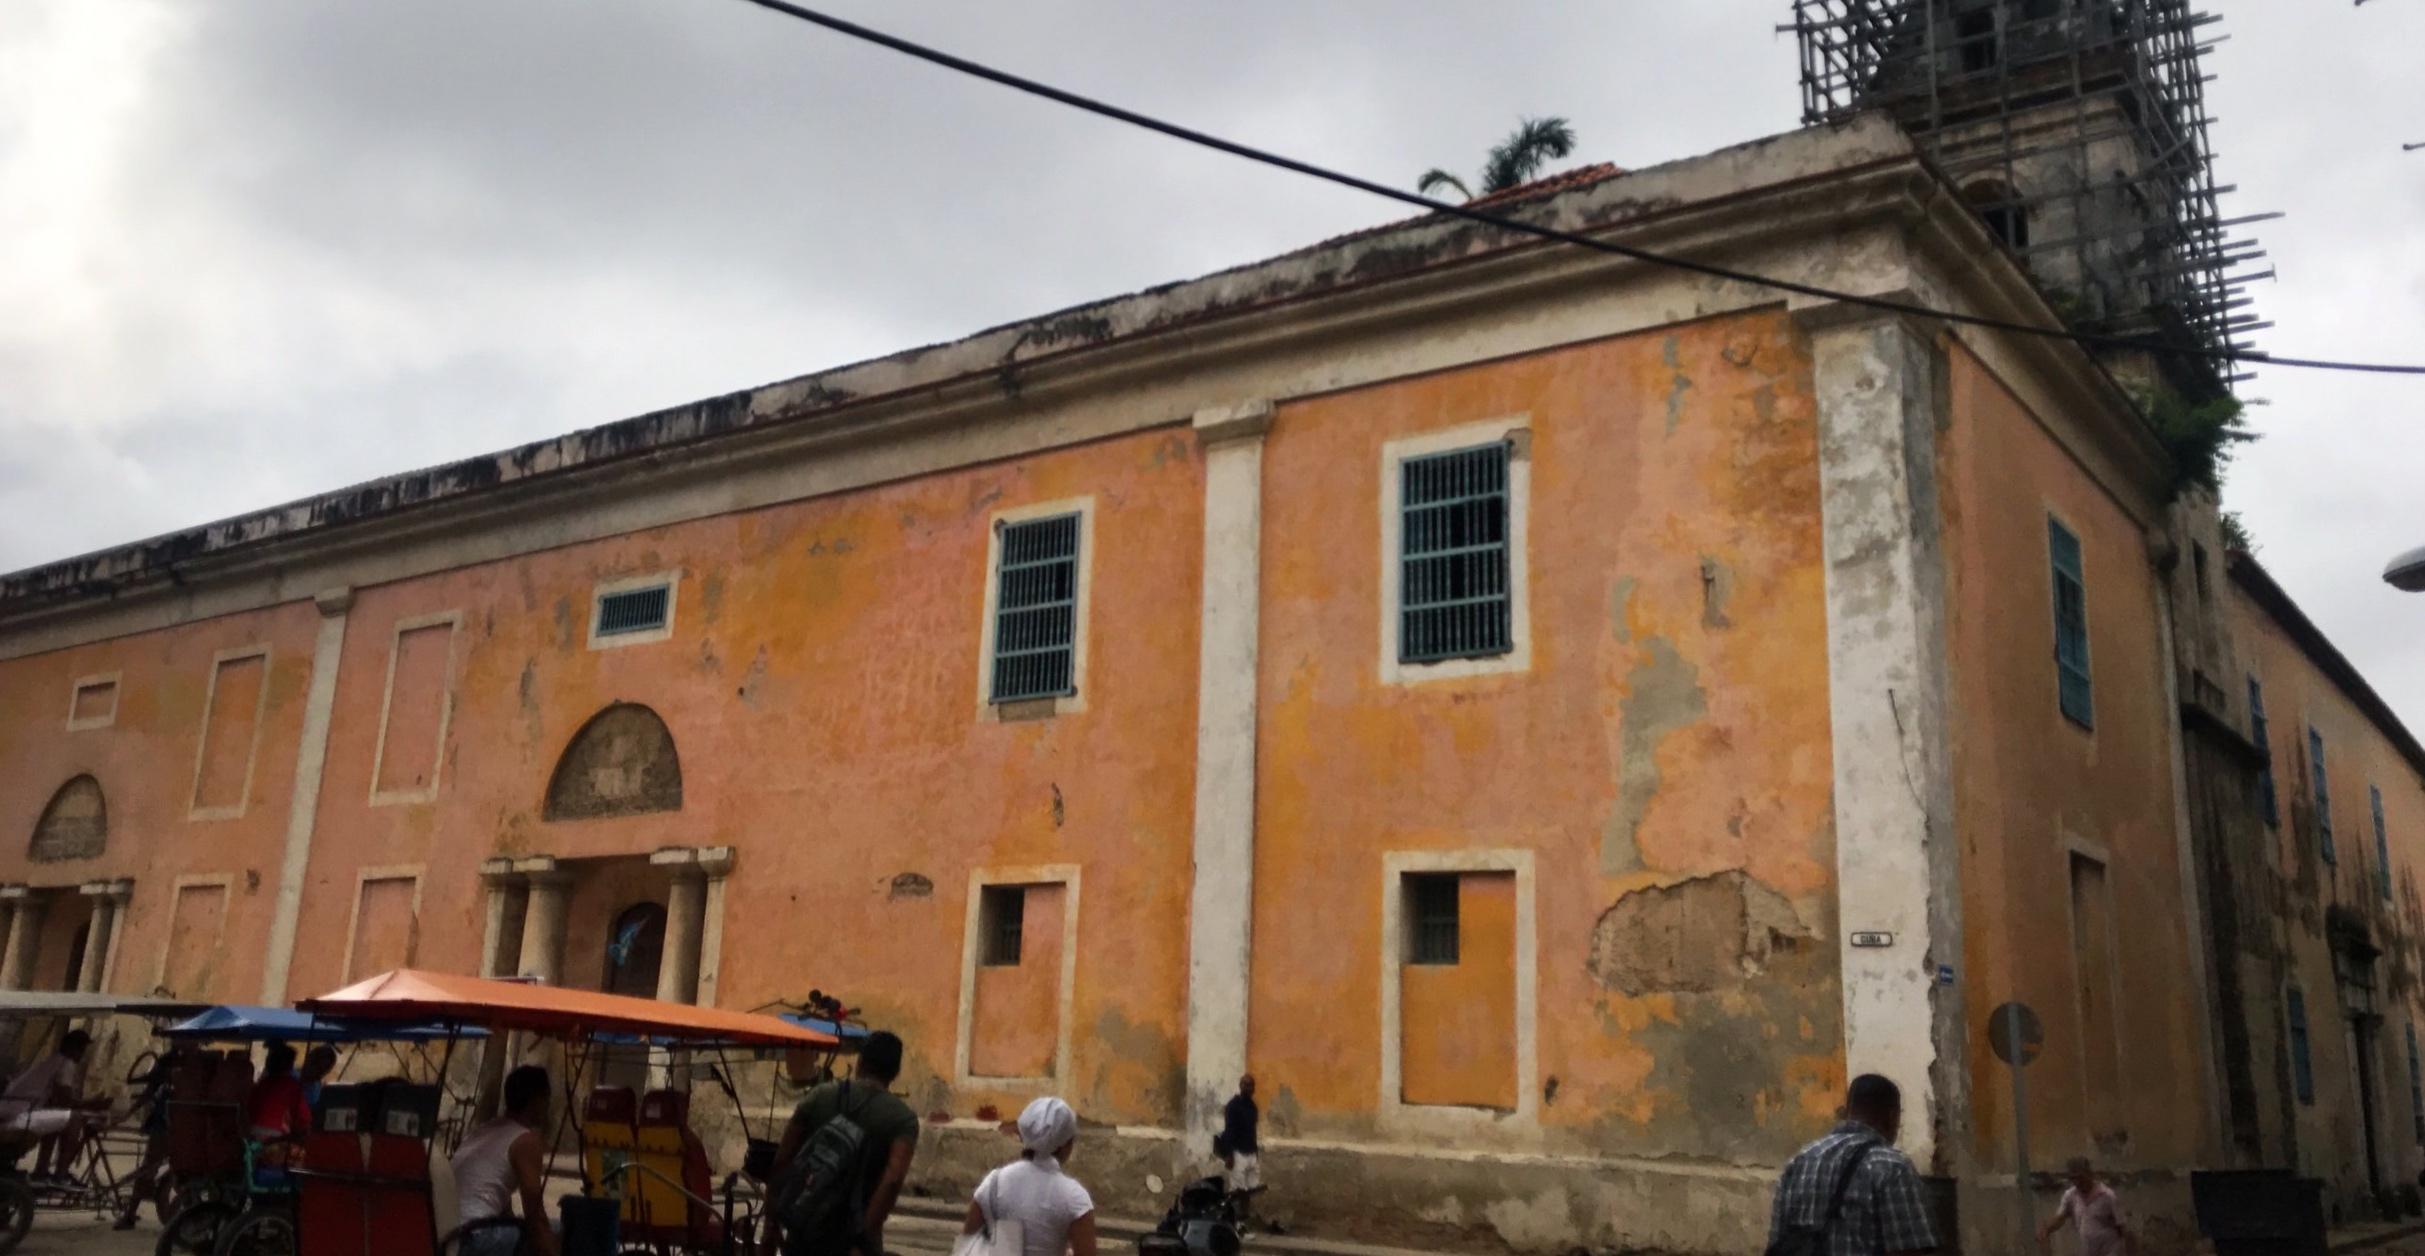 Santa Clara Convent, Habana, Cuba